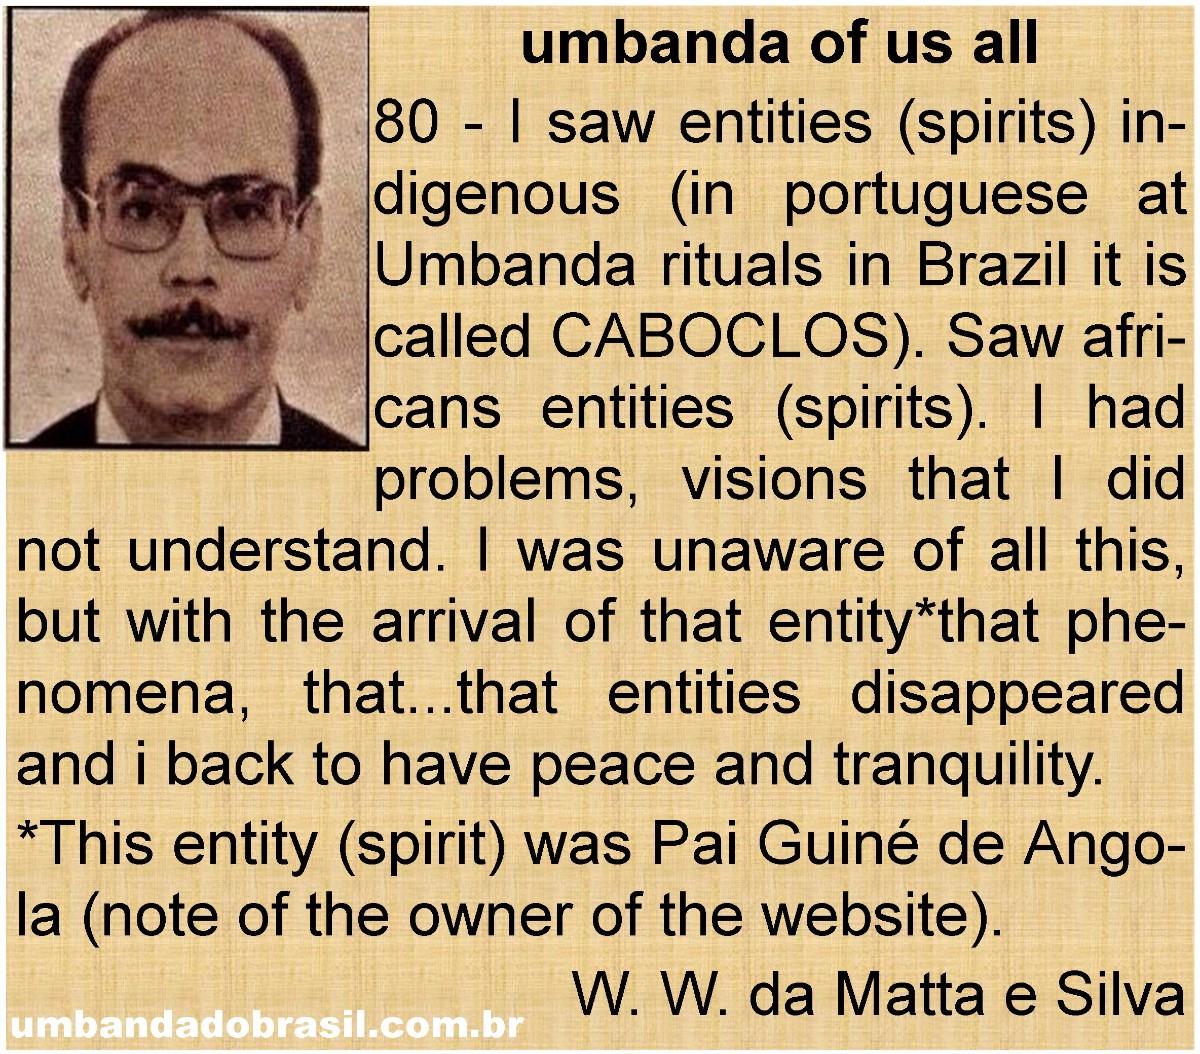 http://images.comunidades.net/umb/umbandadobrasil/80_1_frases_de_mata_e_silva.jpg